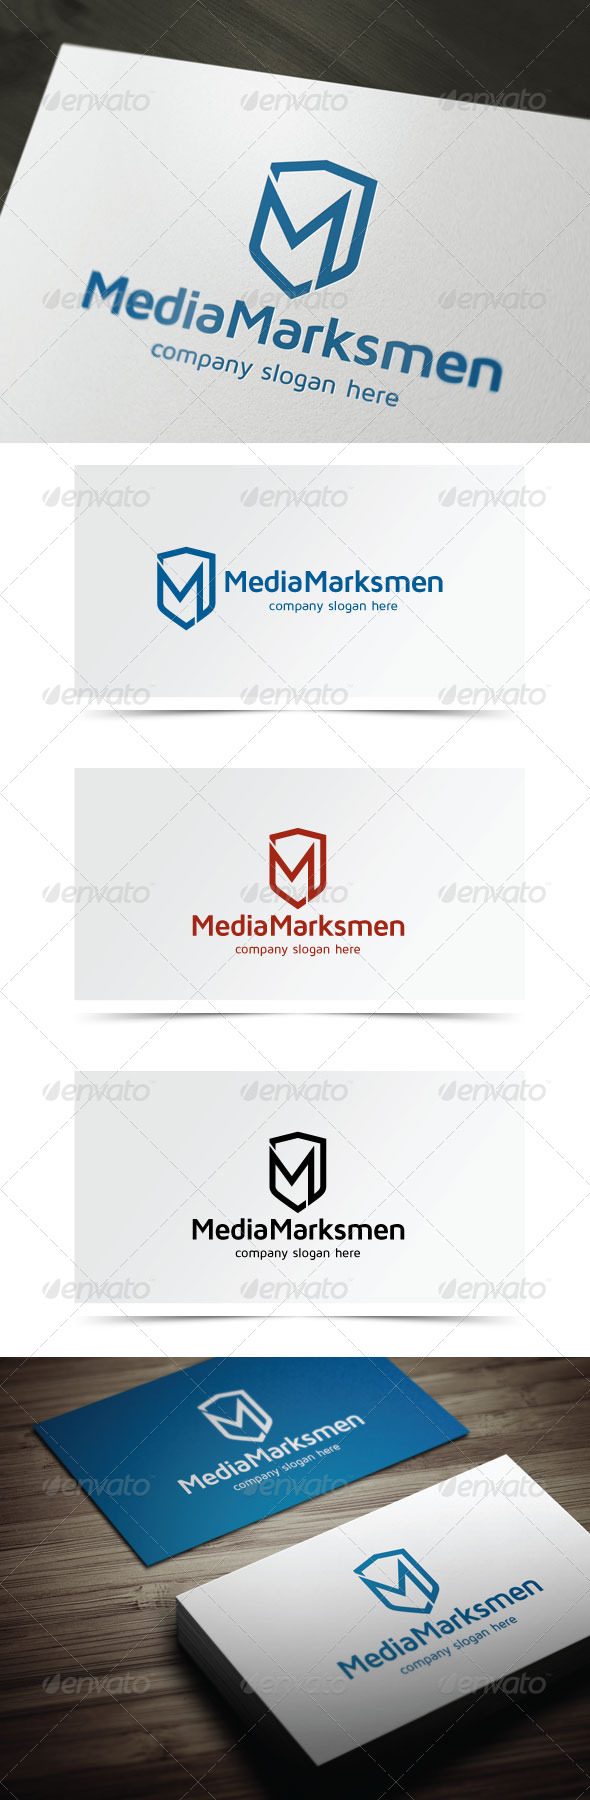 GraphicRiver Media Marksmen 5589736